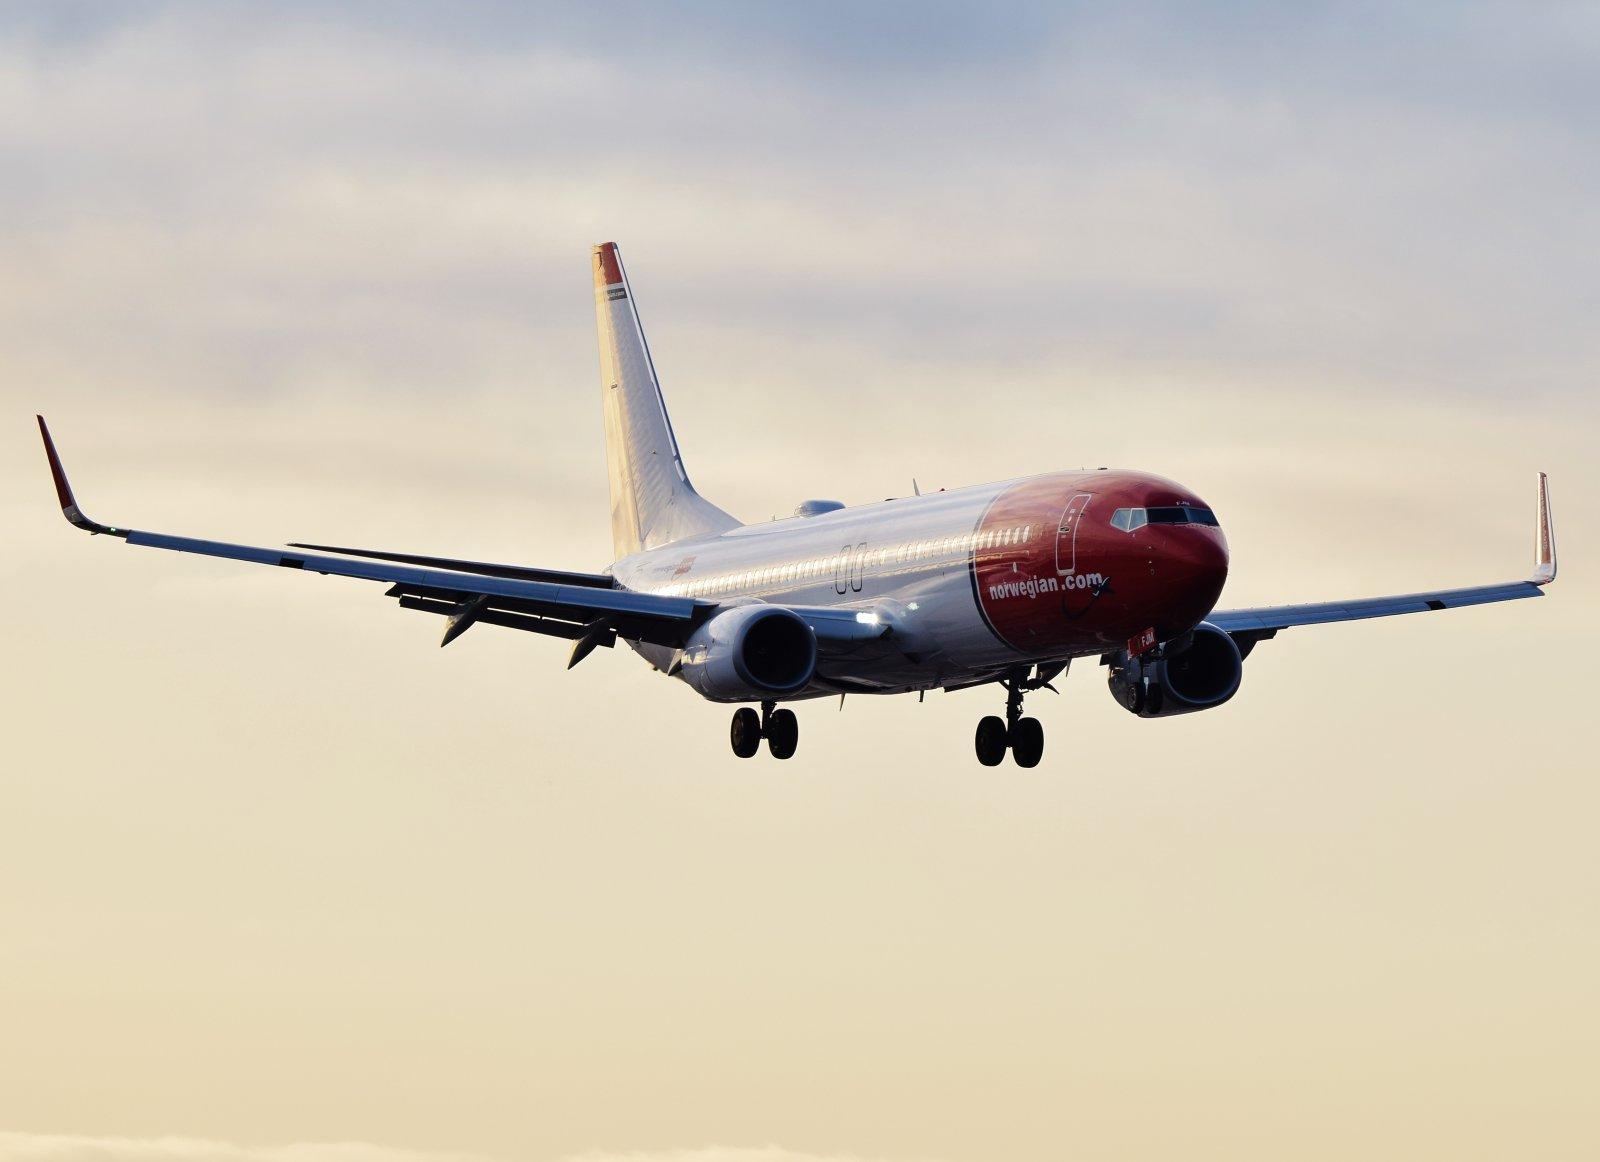 EI-FJM - Boeing 737-8JP - Norwegian Air International - 4.11.2019